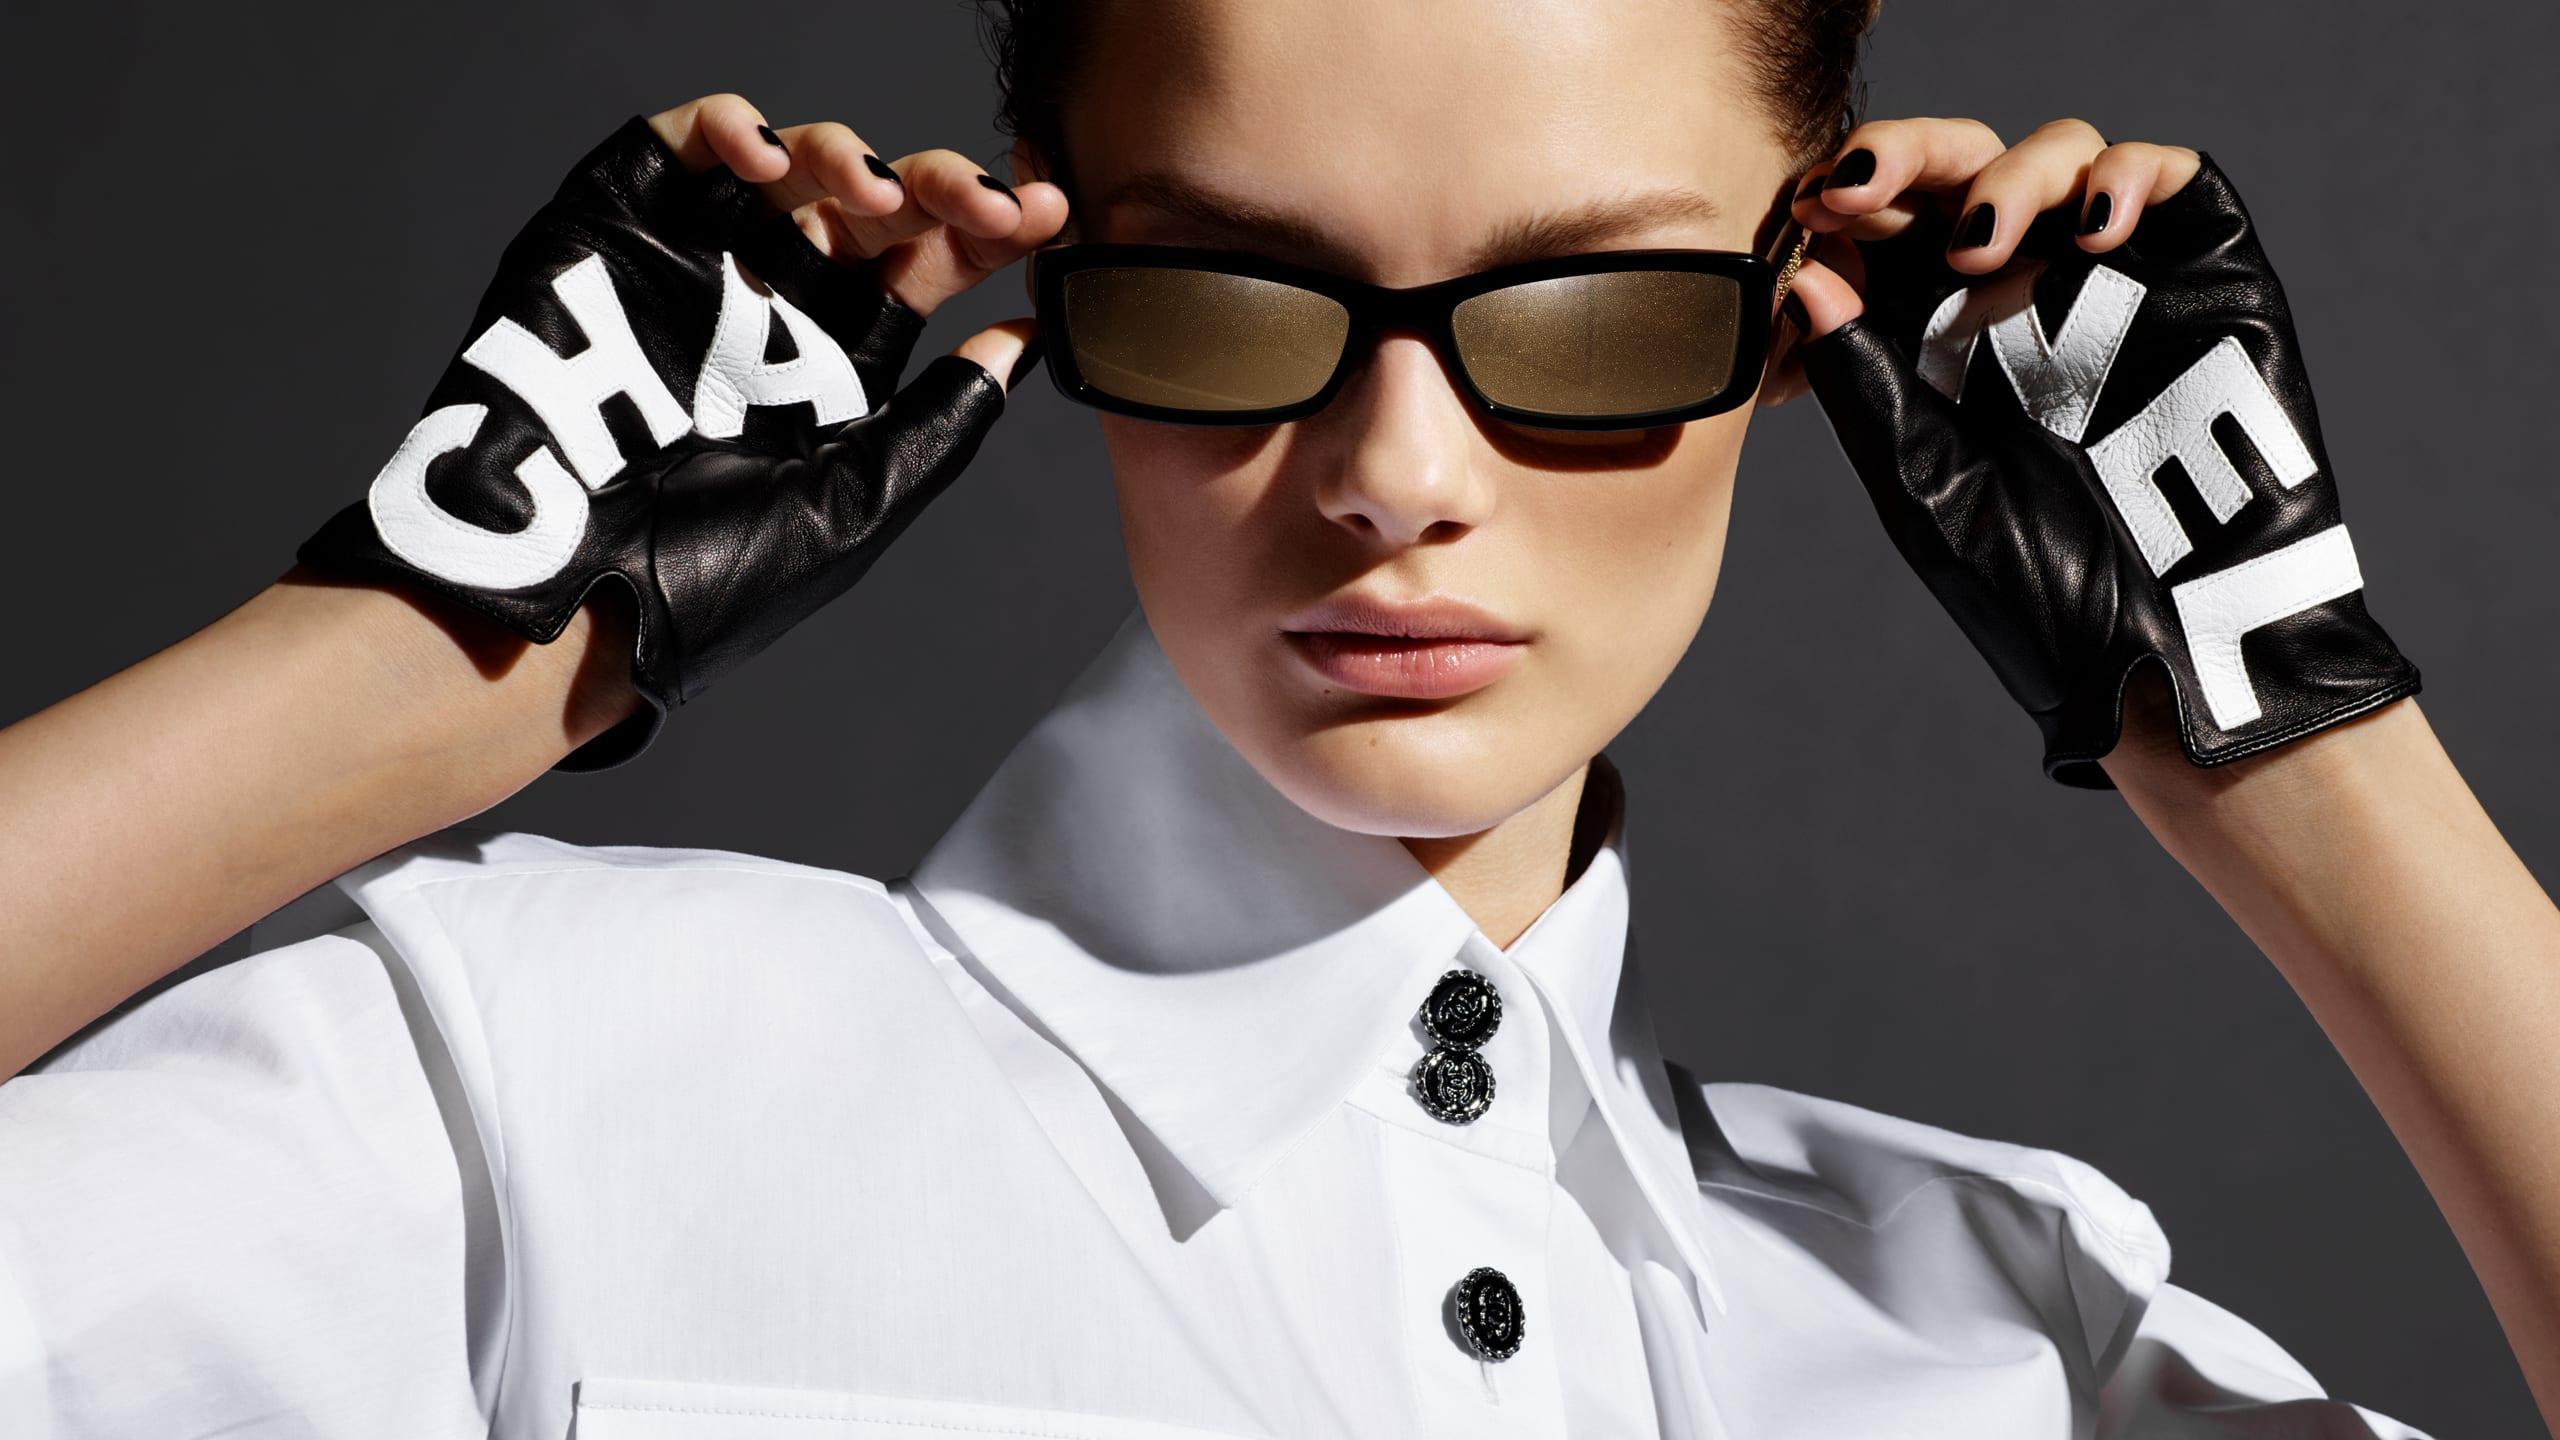 c6e5417ee0 Sunglasses - CHANEL